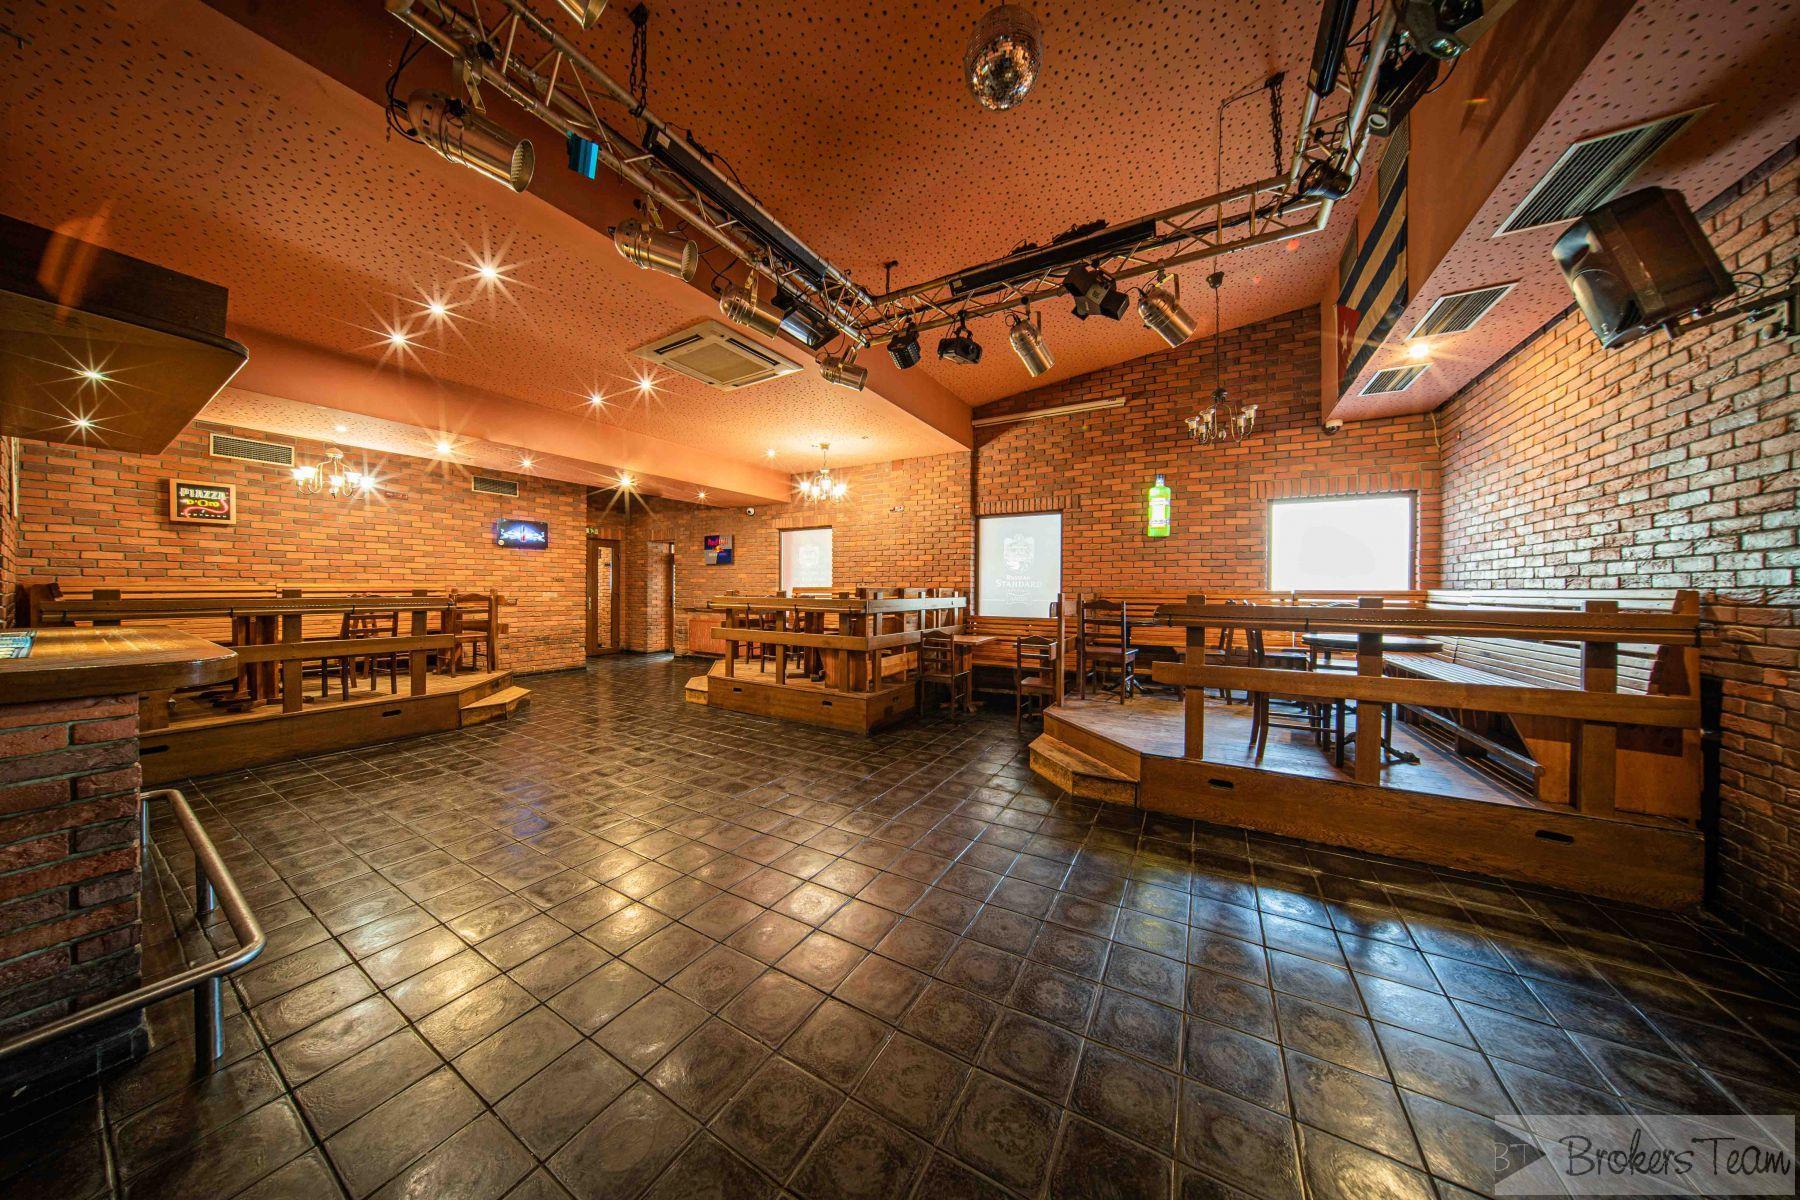 RESTAURACE - BAR - MUSIC CLUB - BISTRO v Neratovicích